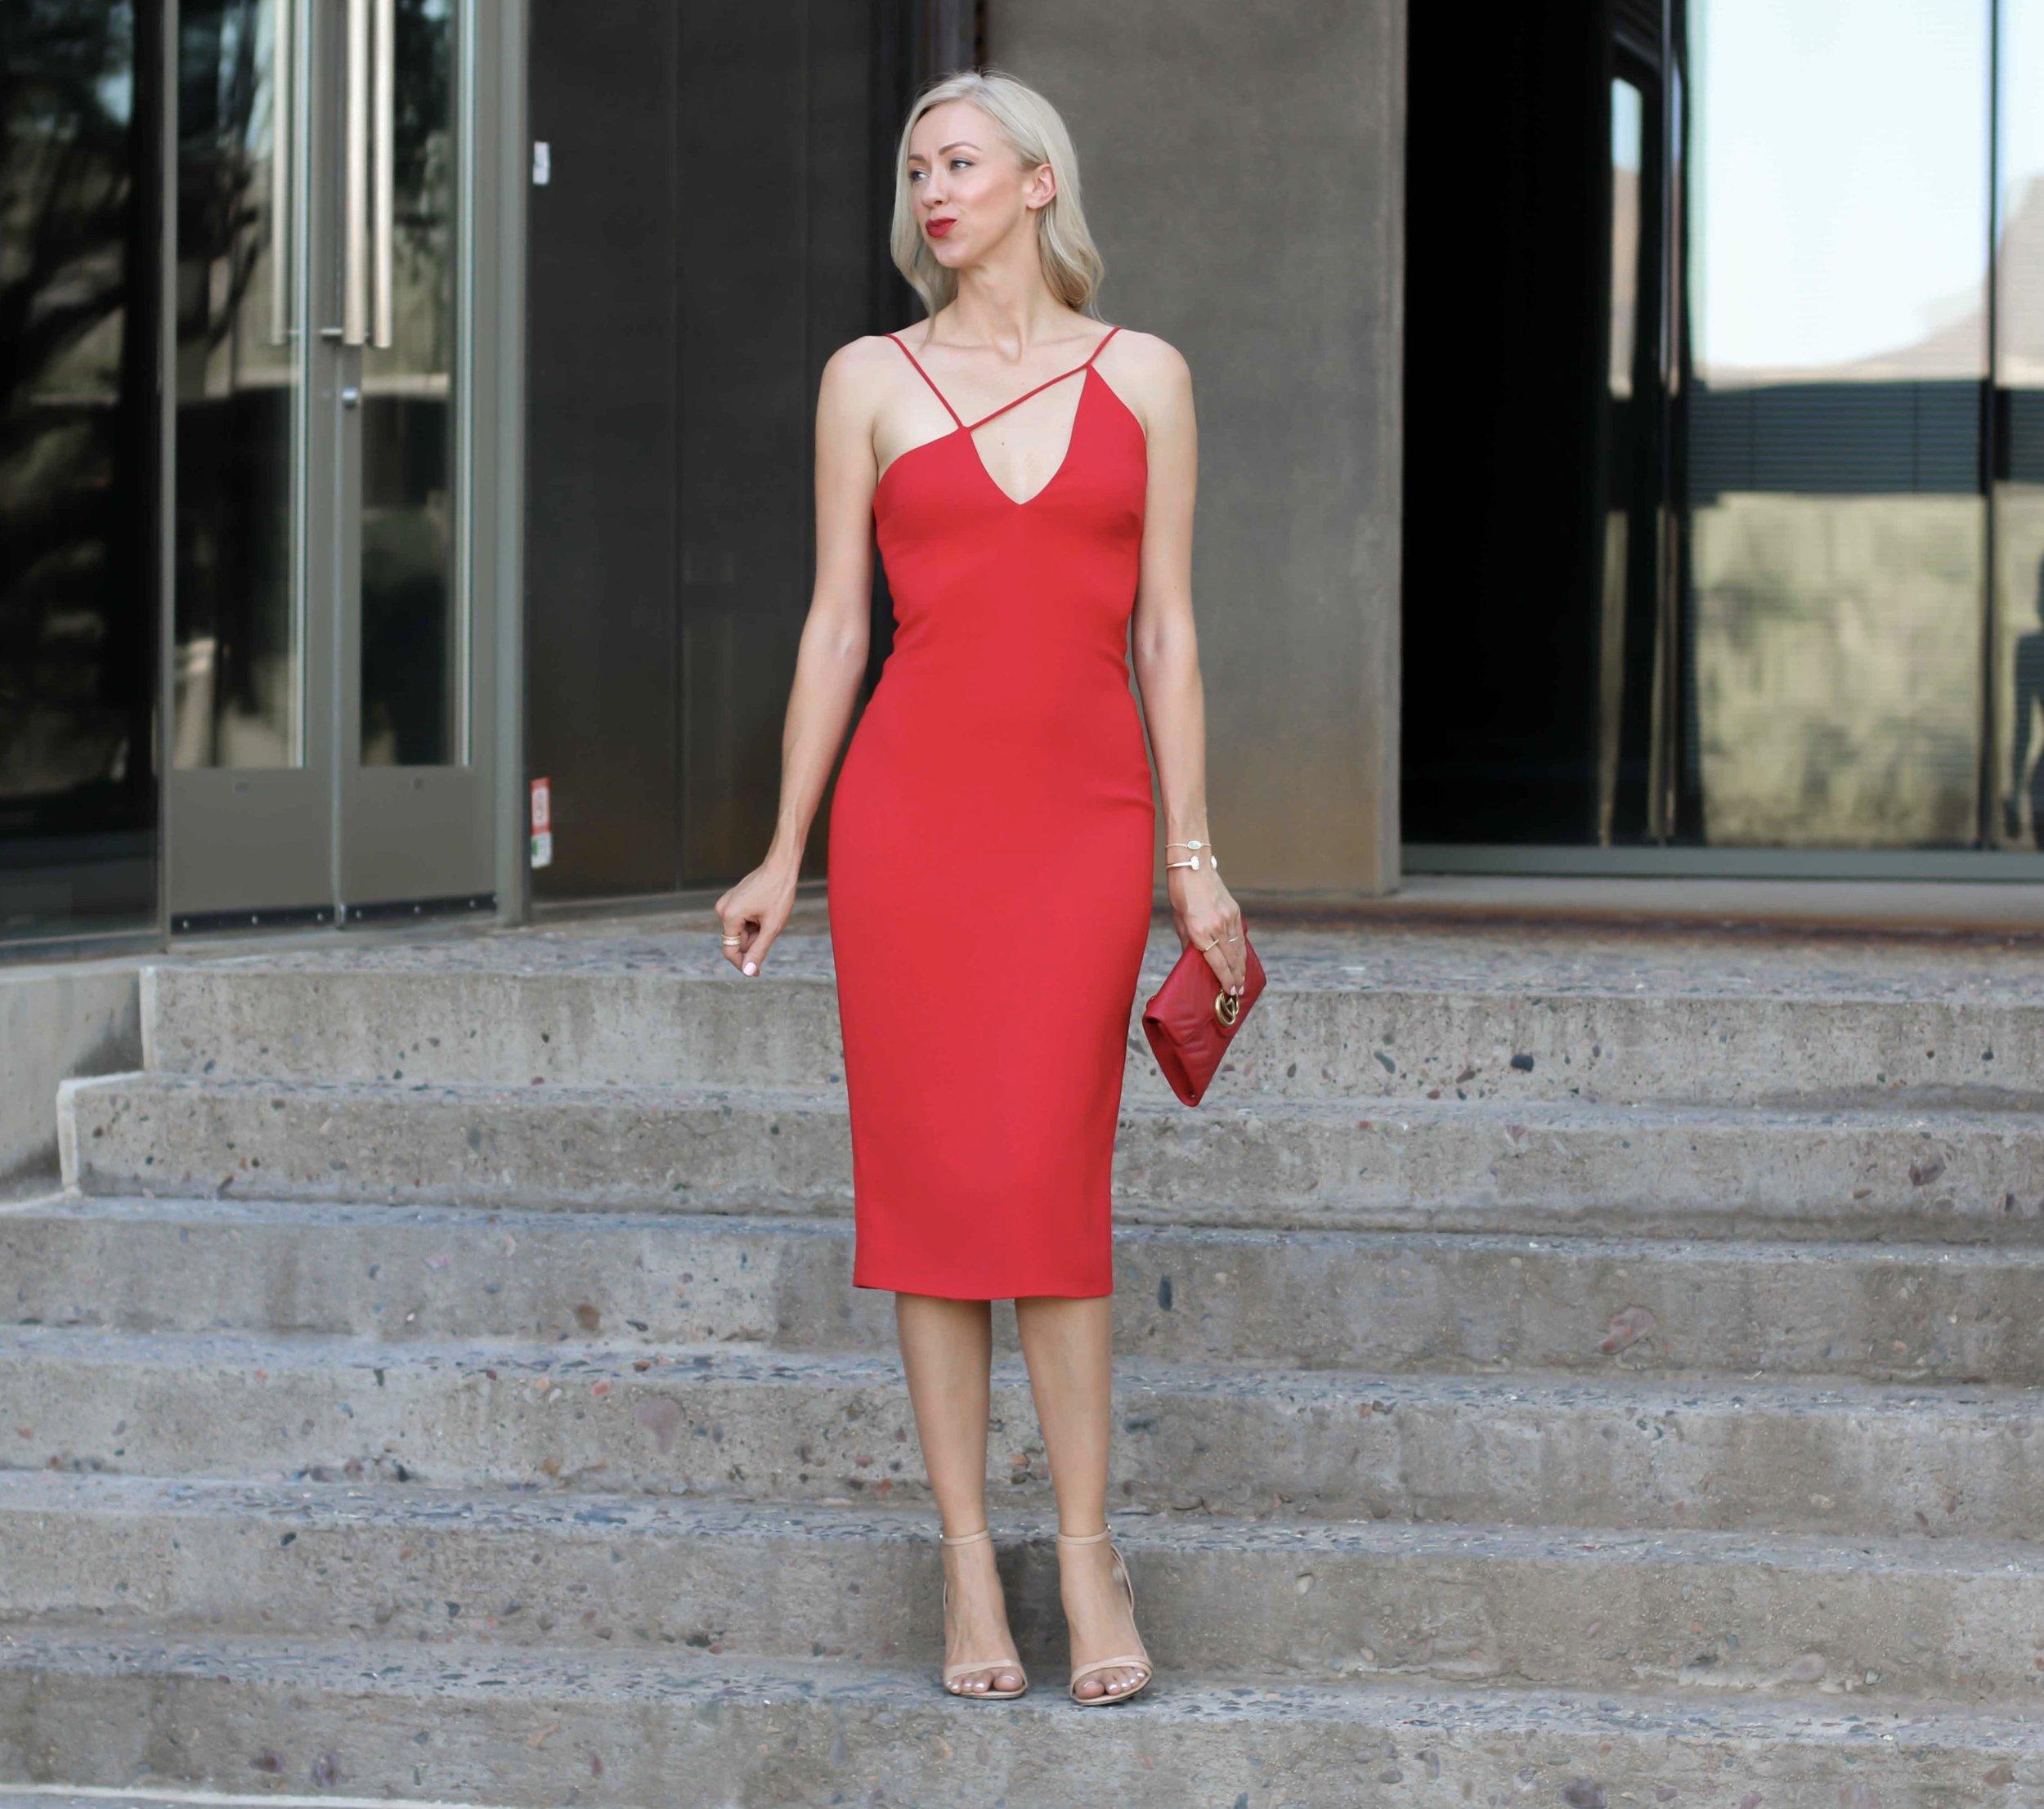 recleau-cushnie-dropsale-red-karina-slip-dress.jpg